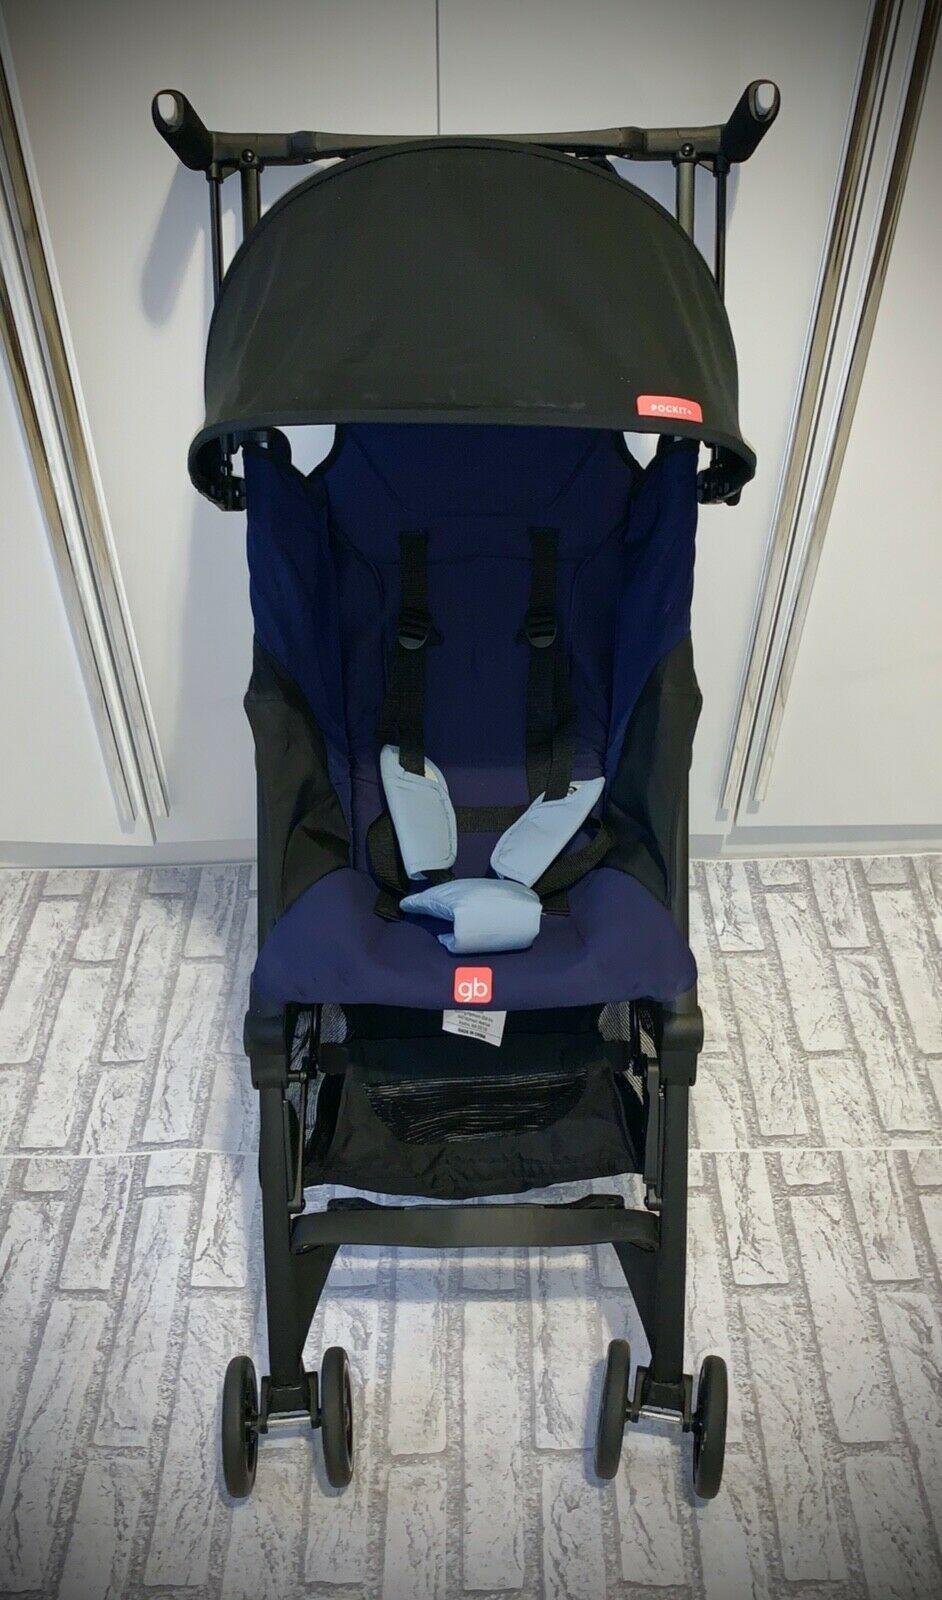 gb Pockit Stroller. Fits in your handbag! Gb pockit